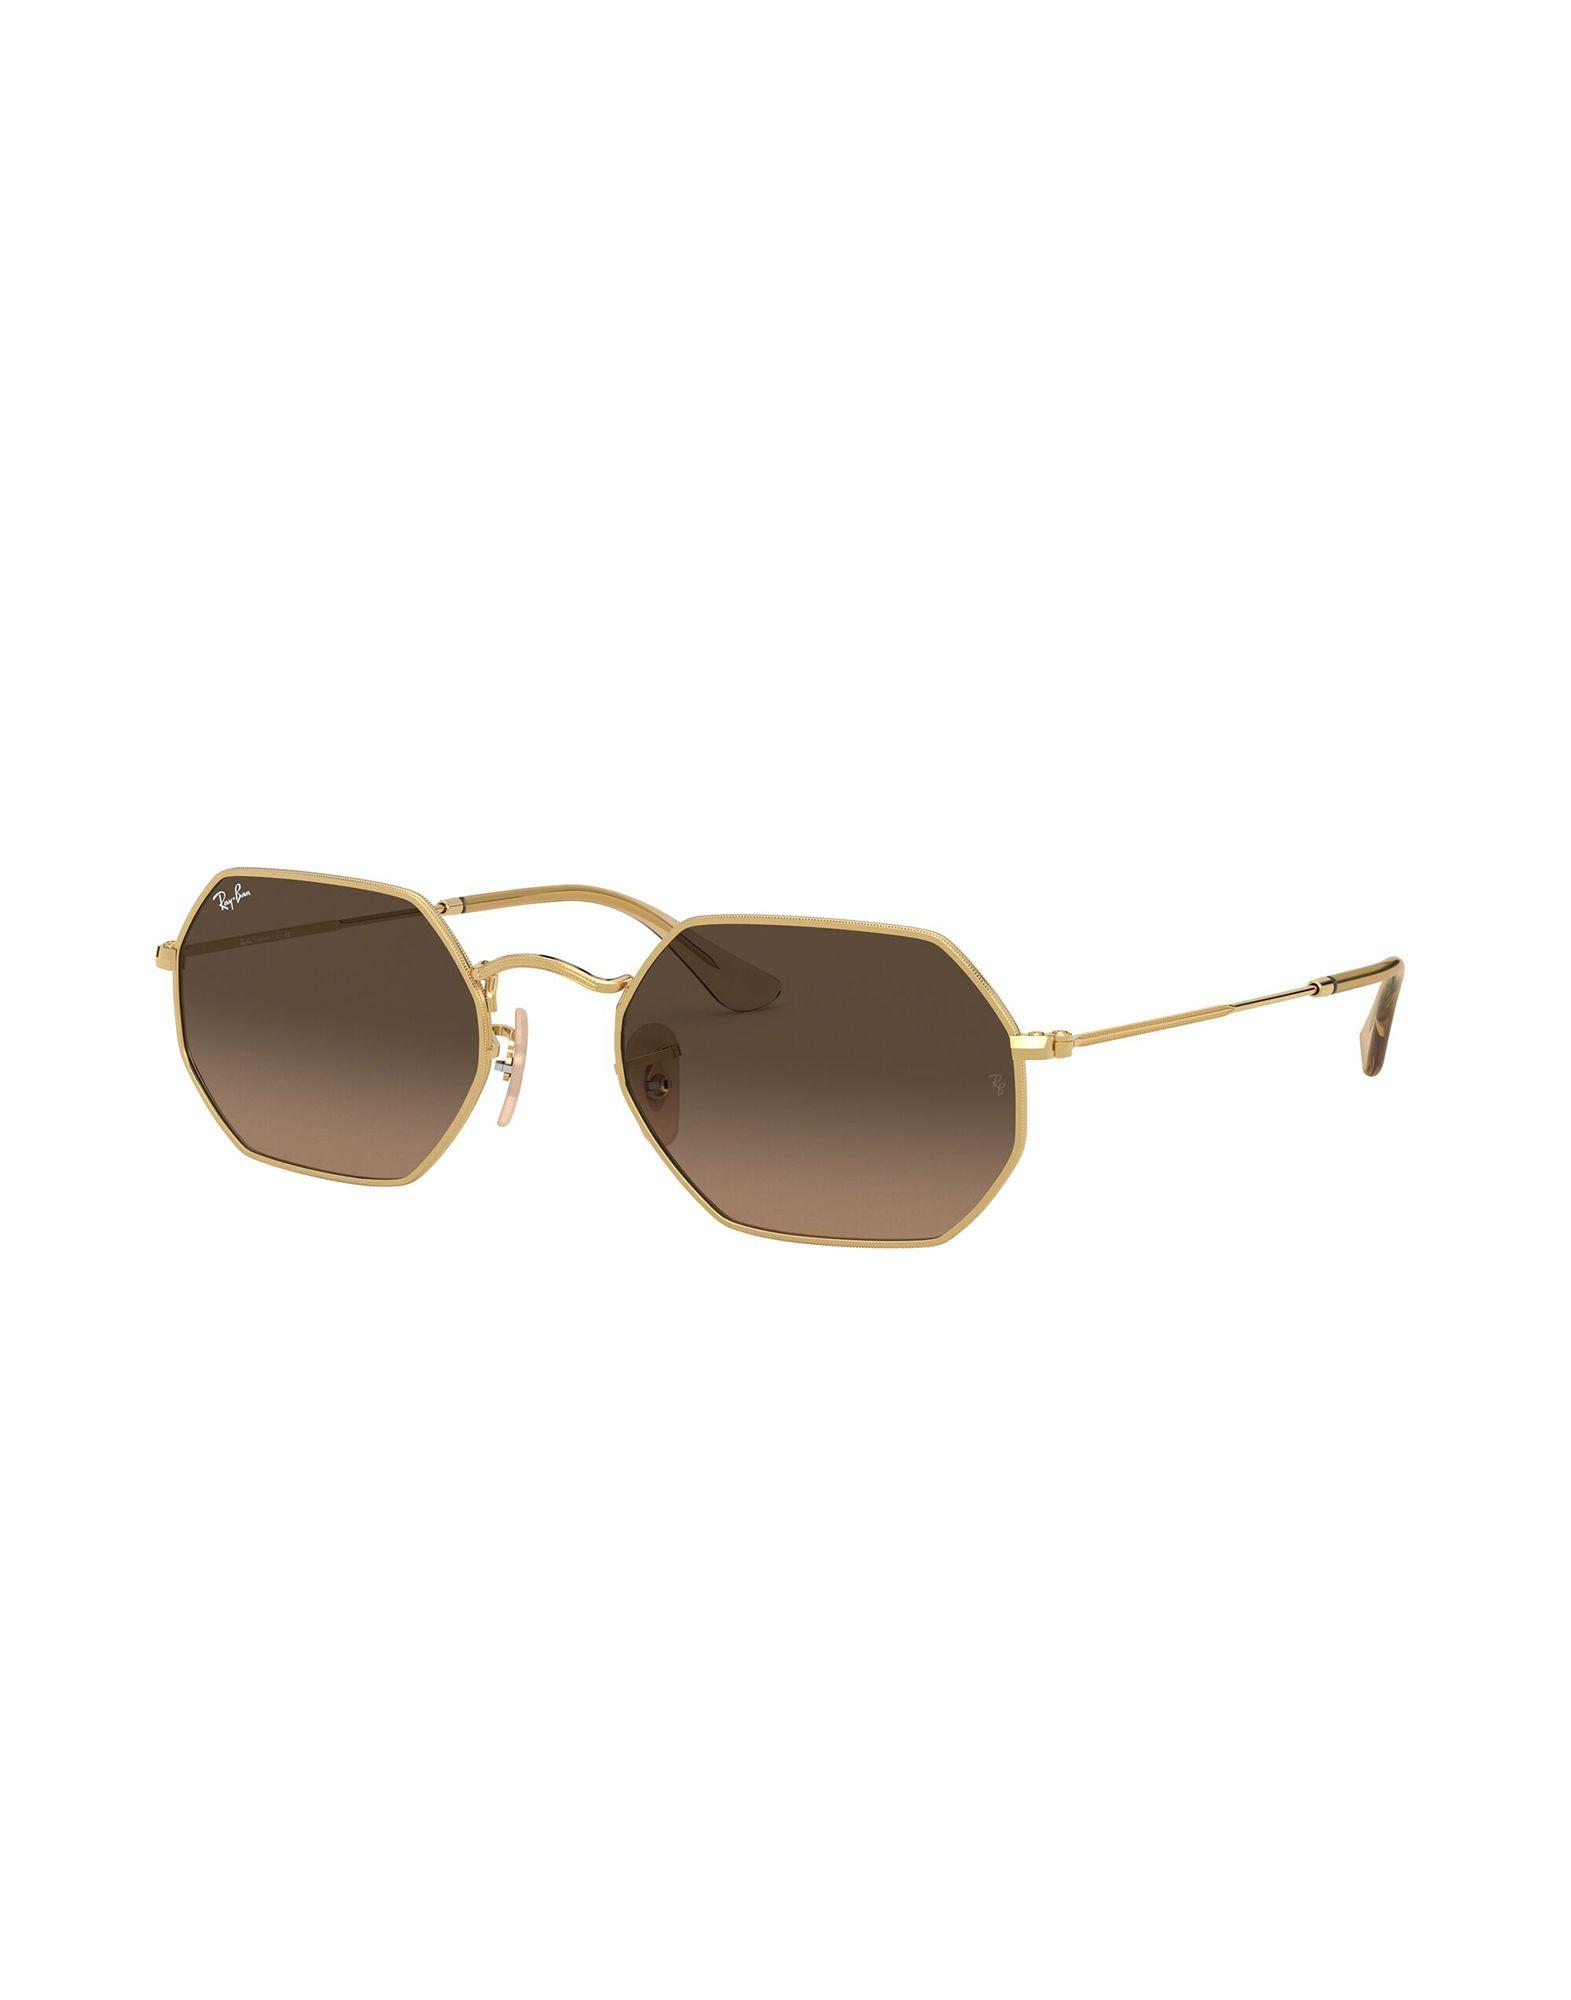 RAY-BAN Солнечные очки ray ban 0rb3025 004 5858